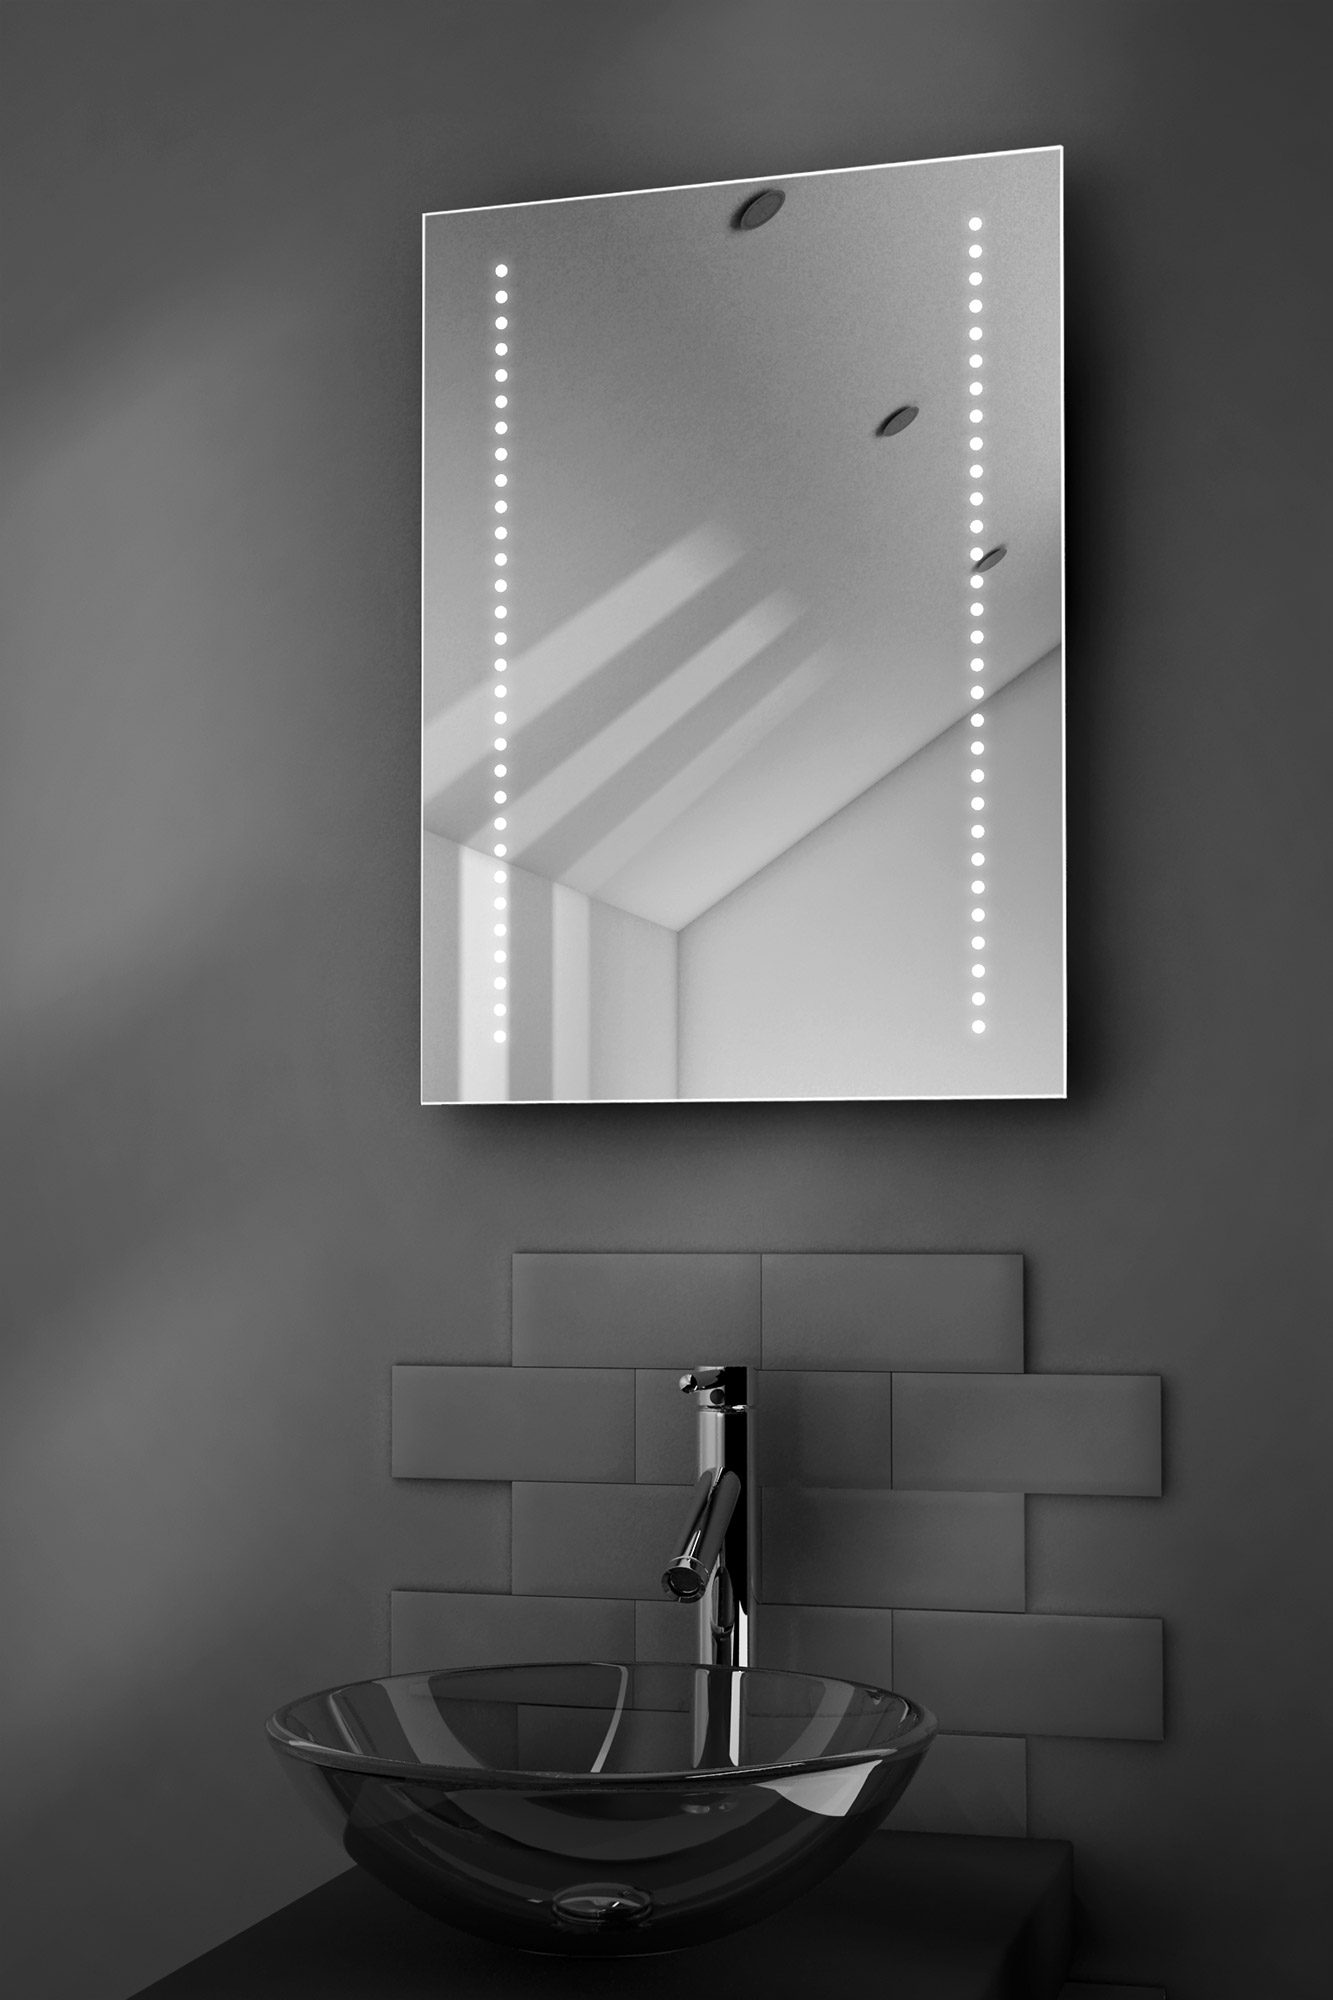 Gaze ultra slim led bathroom illuminated mirror with demister pad sensor k10e for Illuminated mirrors for bathrooms